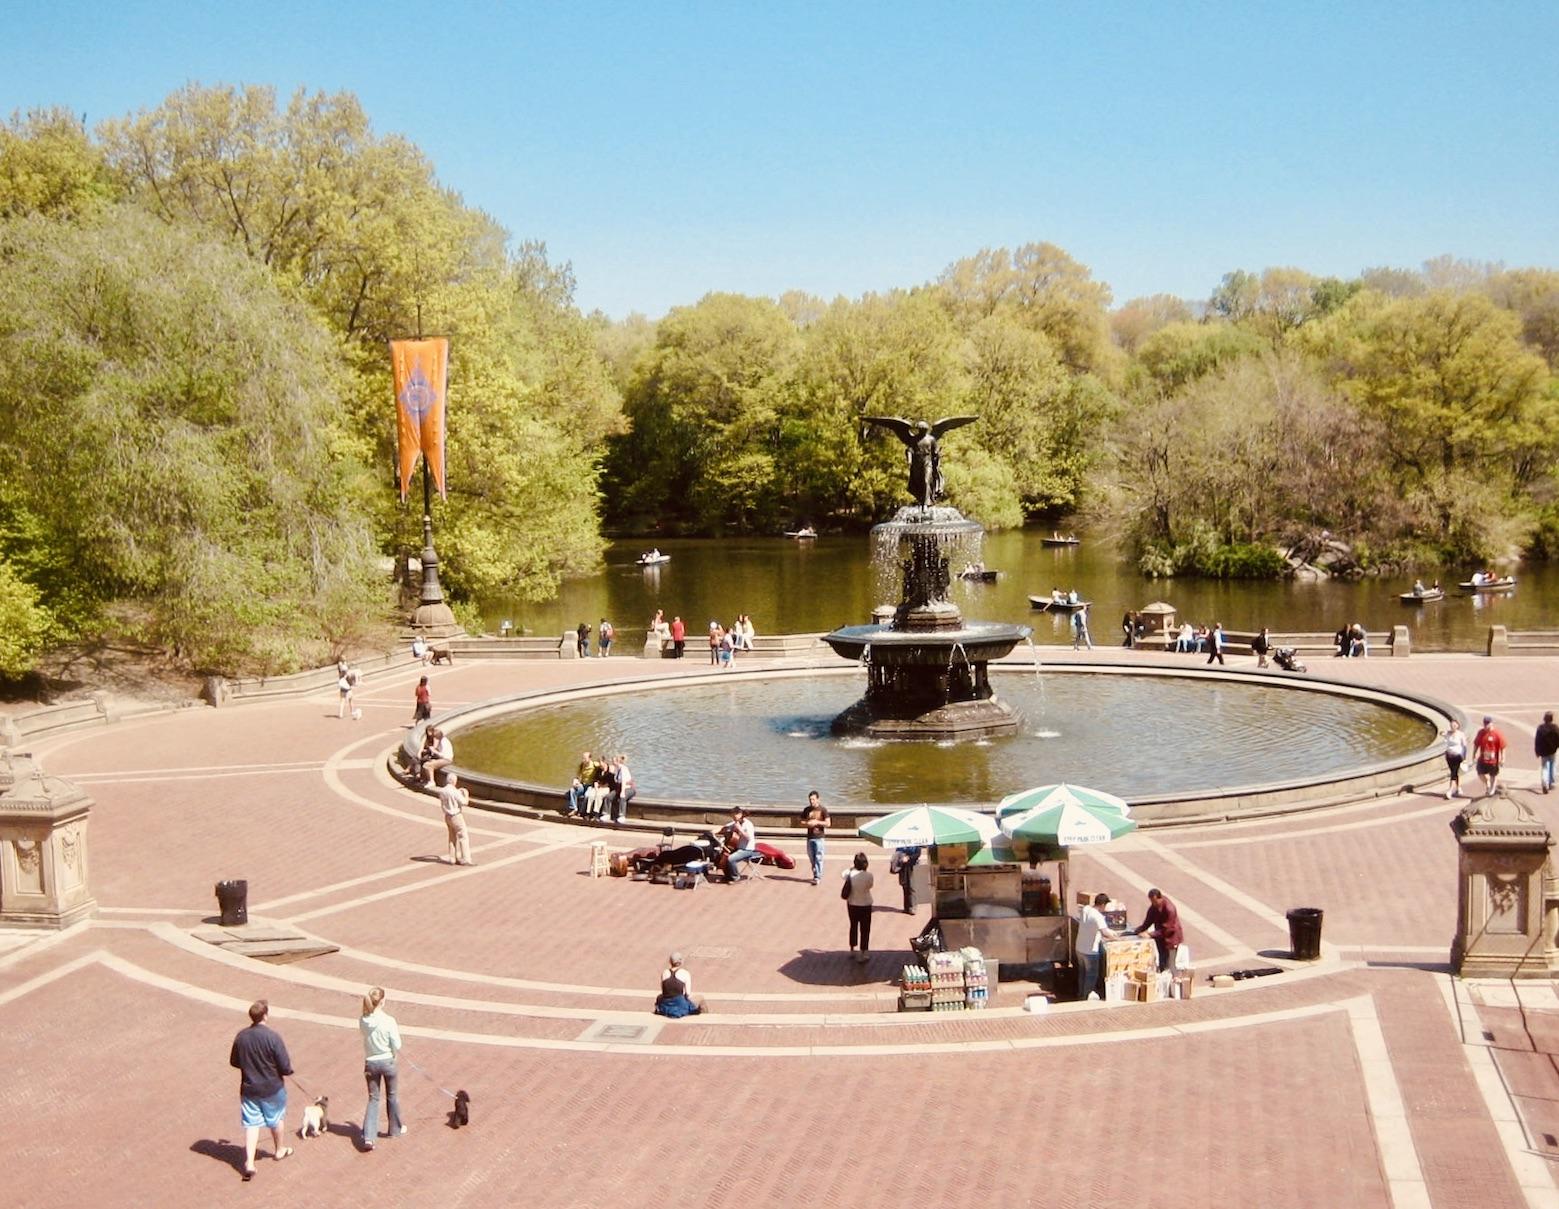 Bethesda Fountain at Central Park